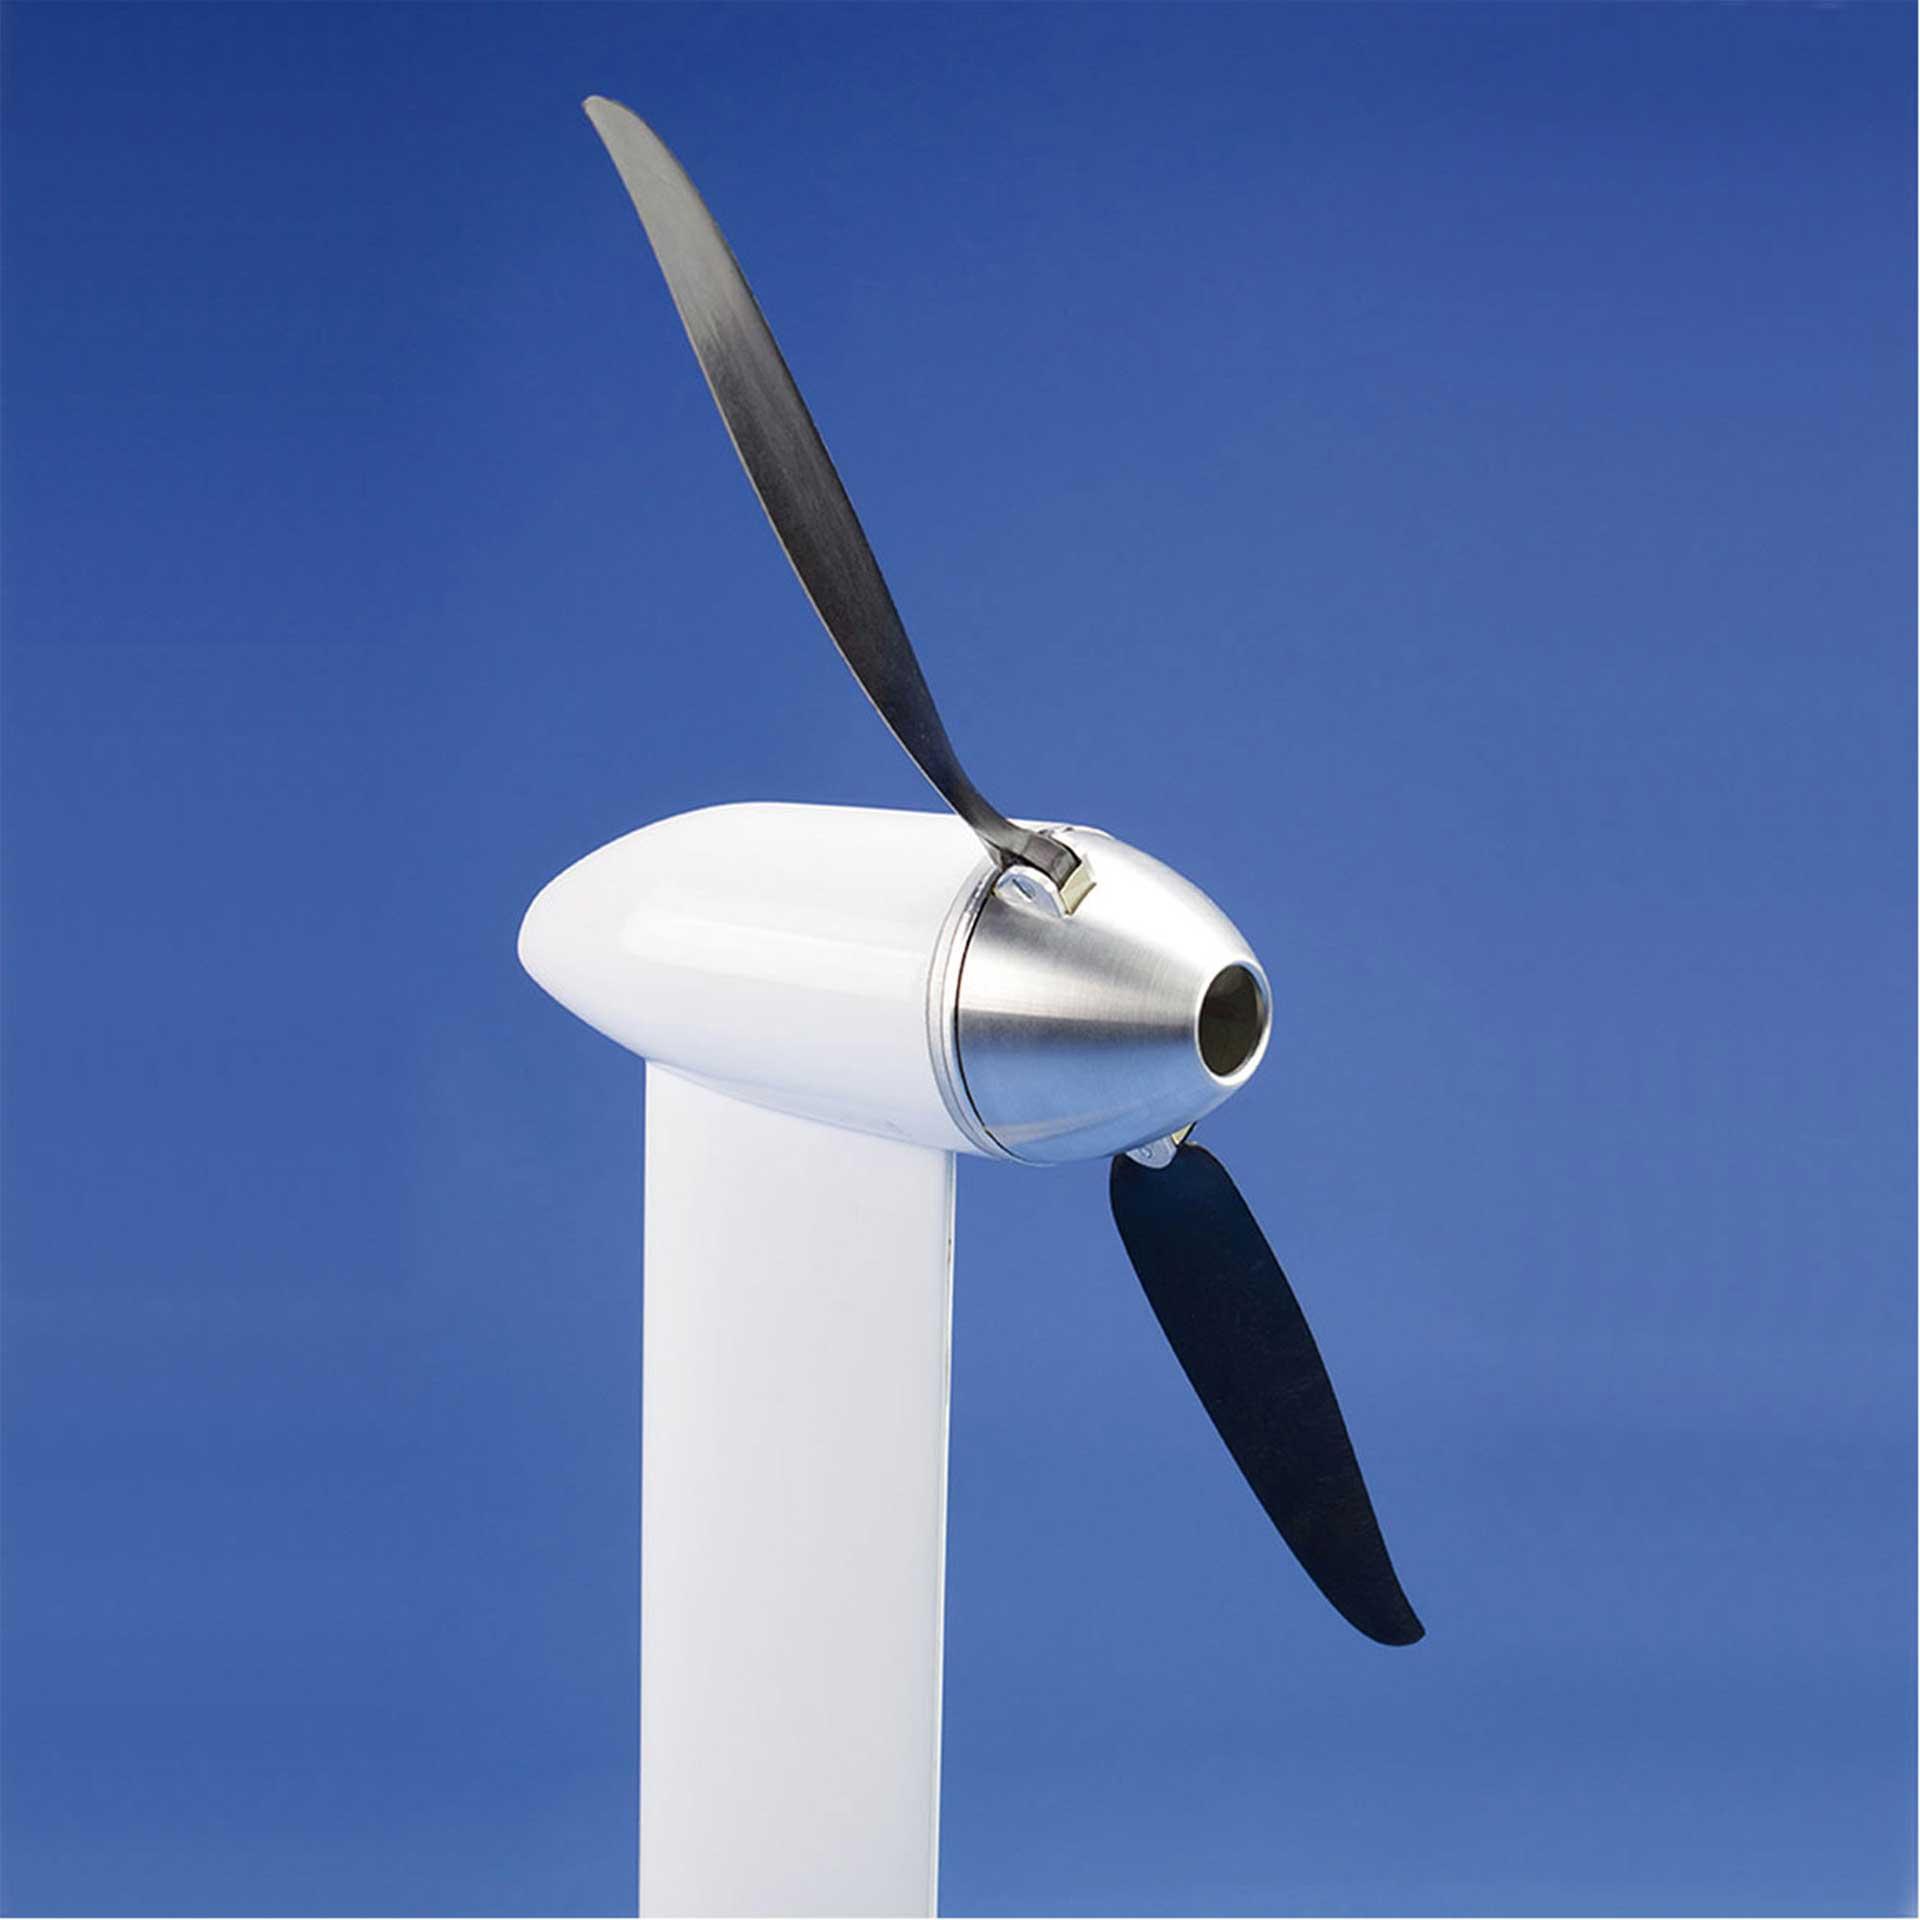 TOPMODEL ENGINE CAP FOR GLIDER BIS CA.13KG SAILPLANE POWER POD LAUNCHING SYSTEM